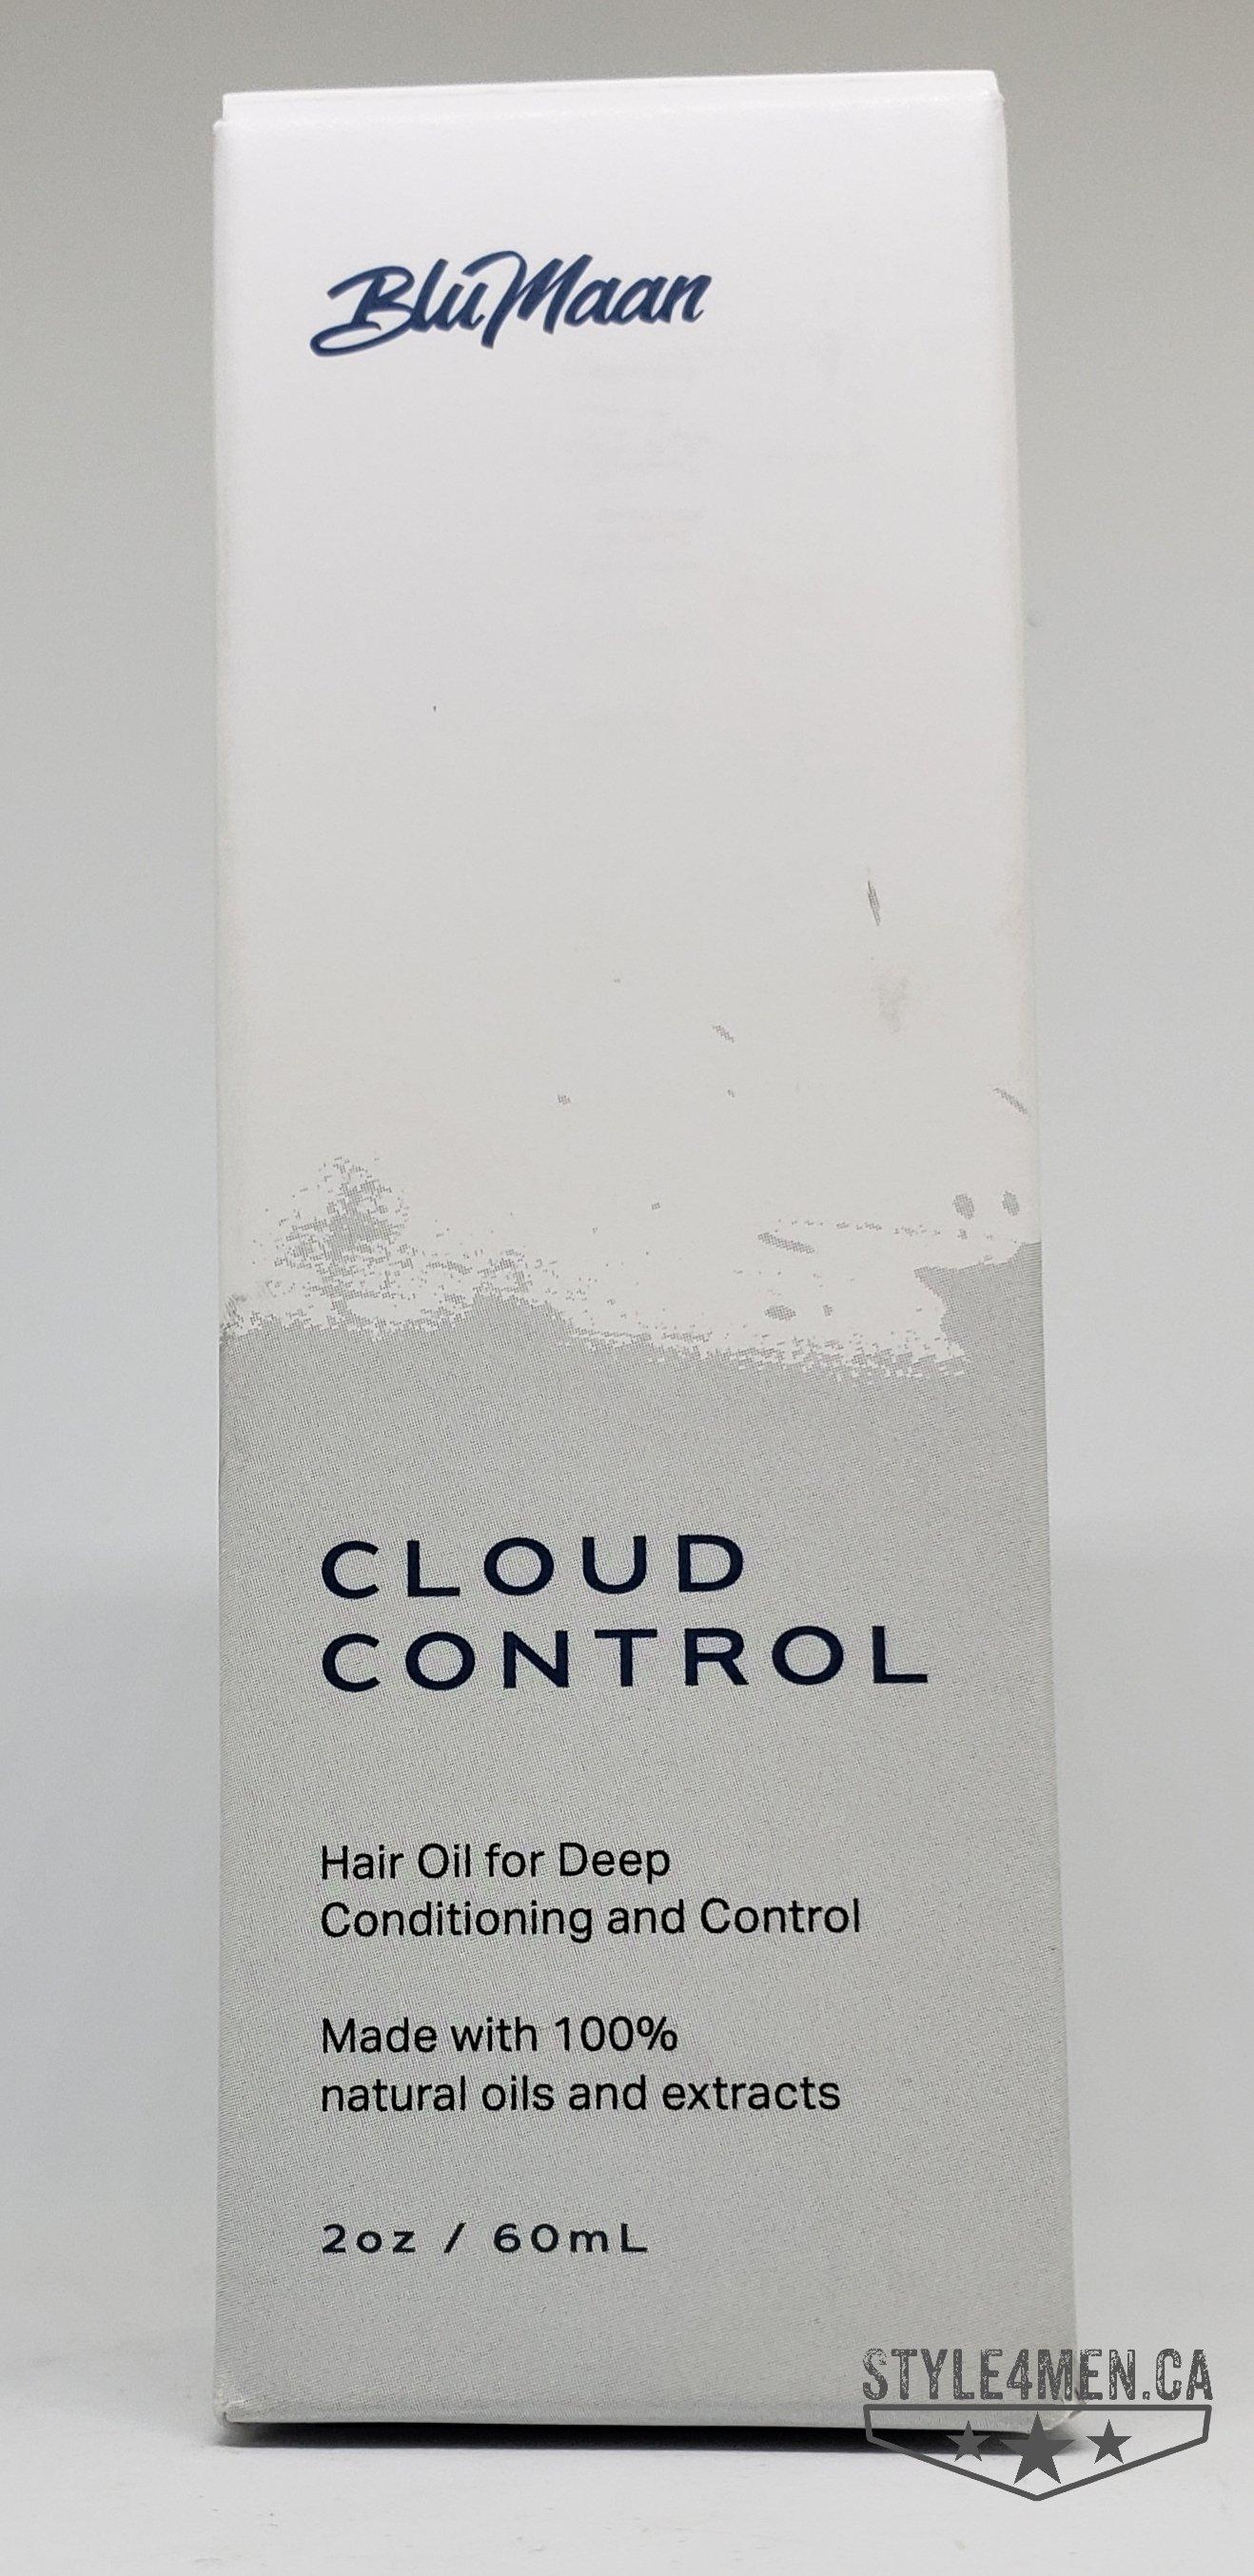 BluMaan Cloud Control